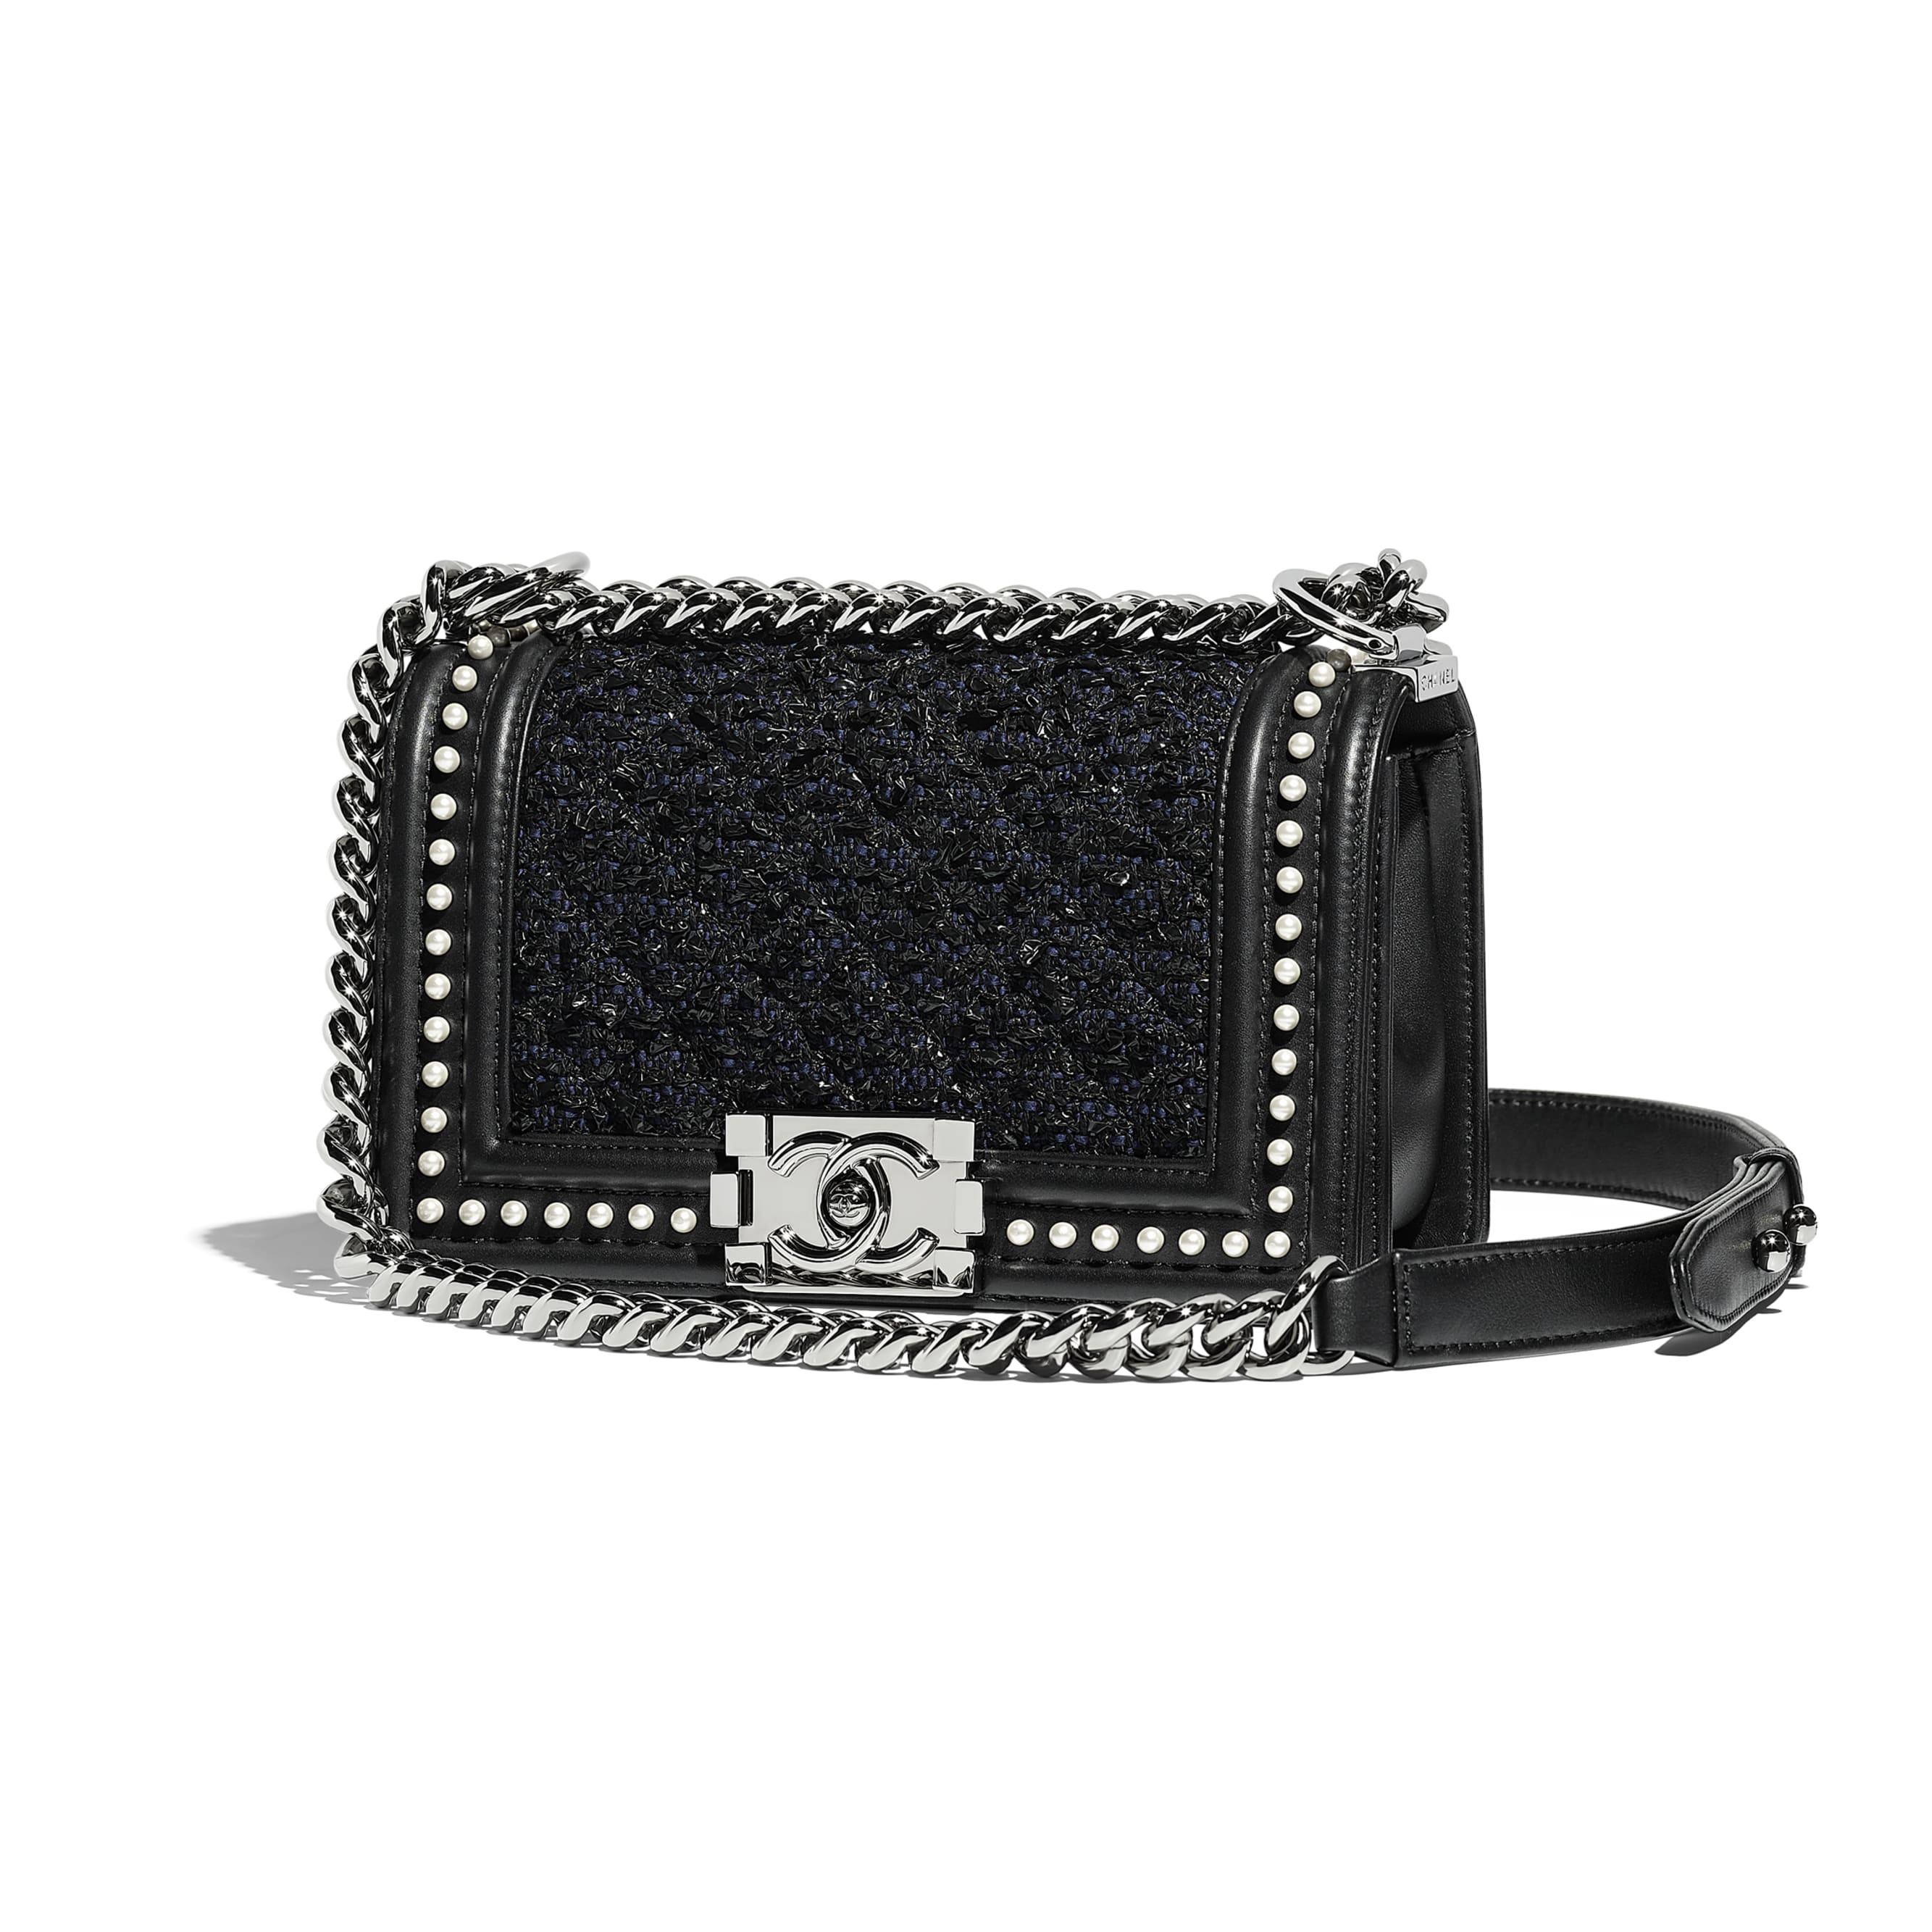 Small BOY CHANEL Handbag - Black & Navy Blue - Tweed, Calfskin, Imitation Pearls & Ruthenium-Finish Metal - Default view - see standard sized version